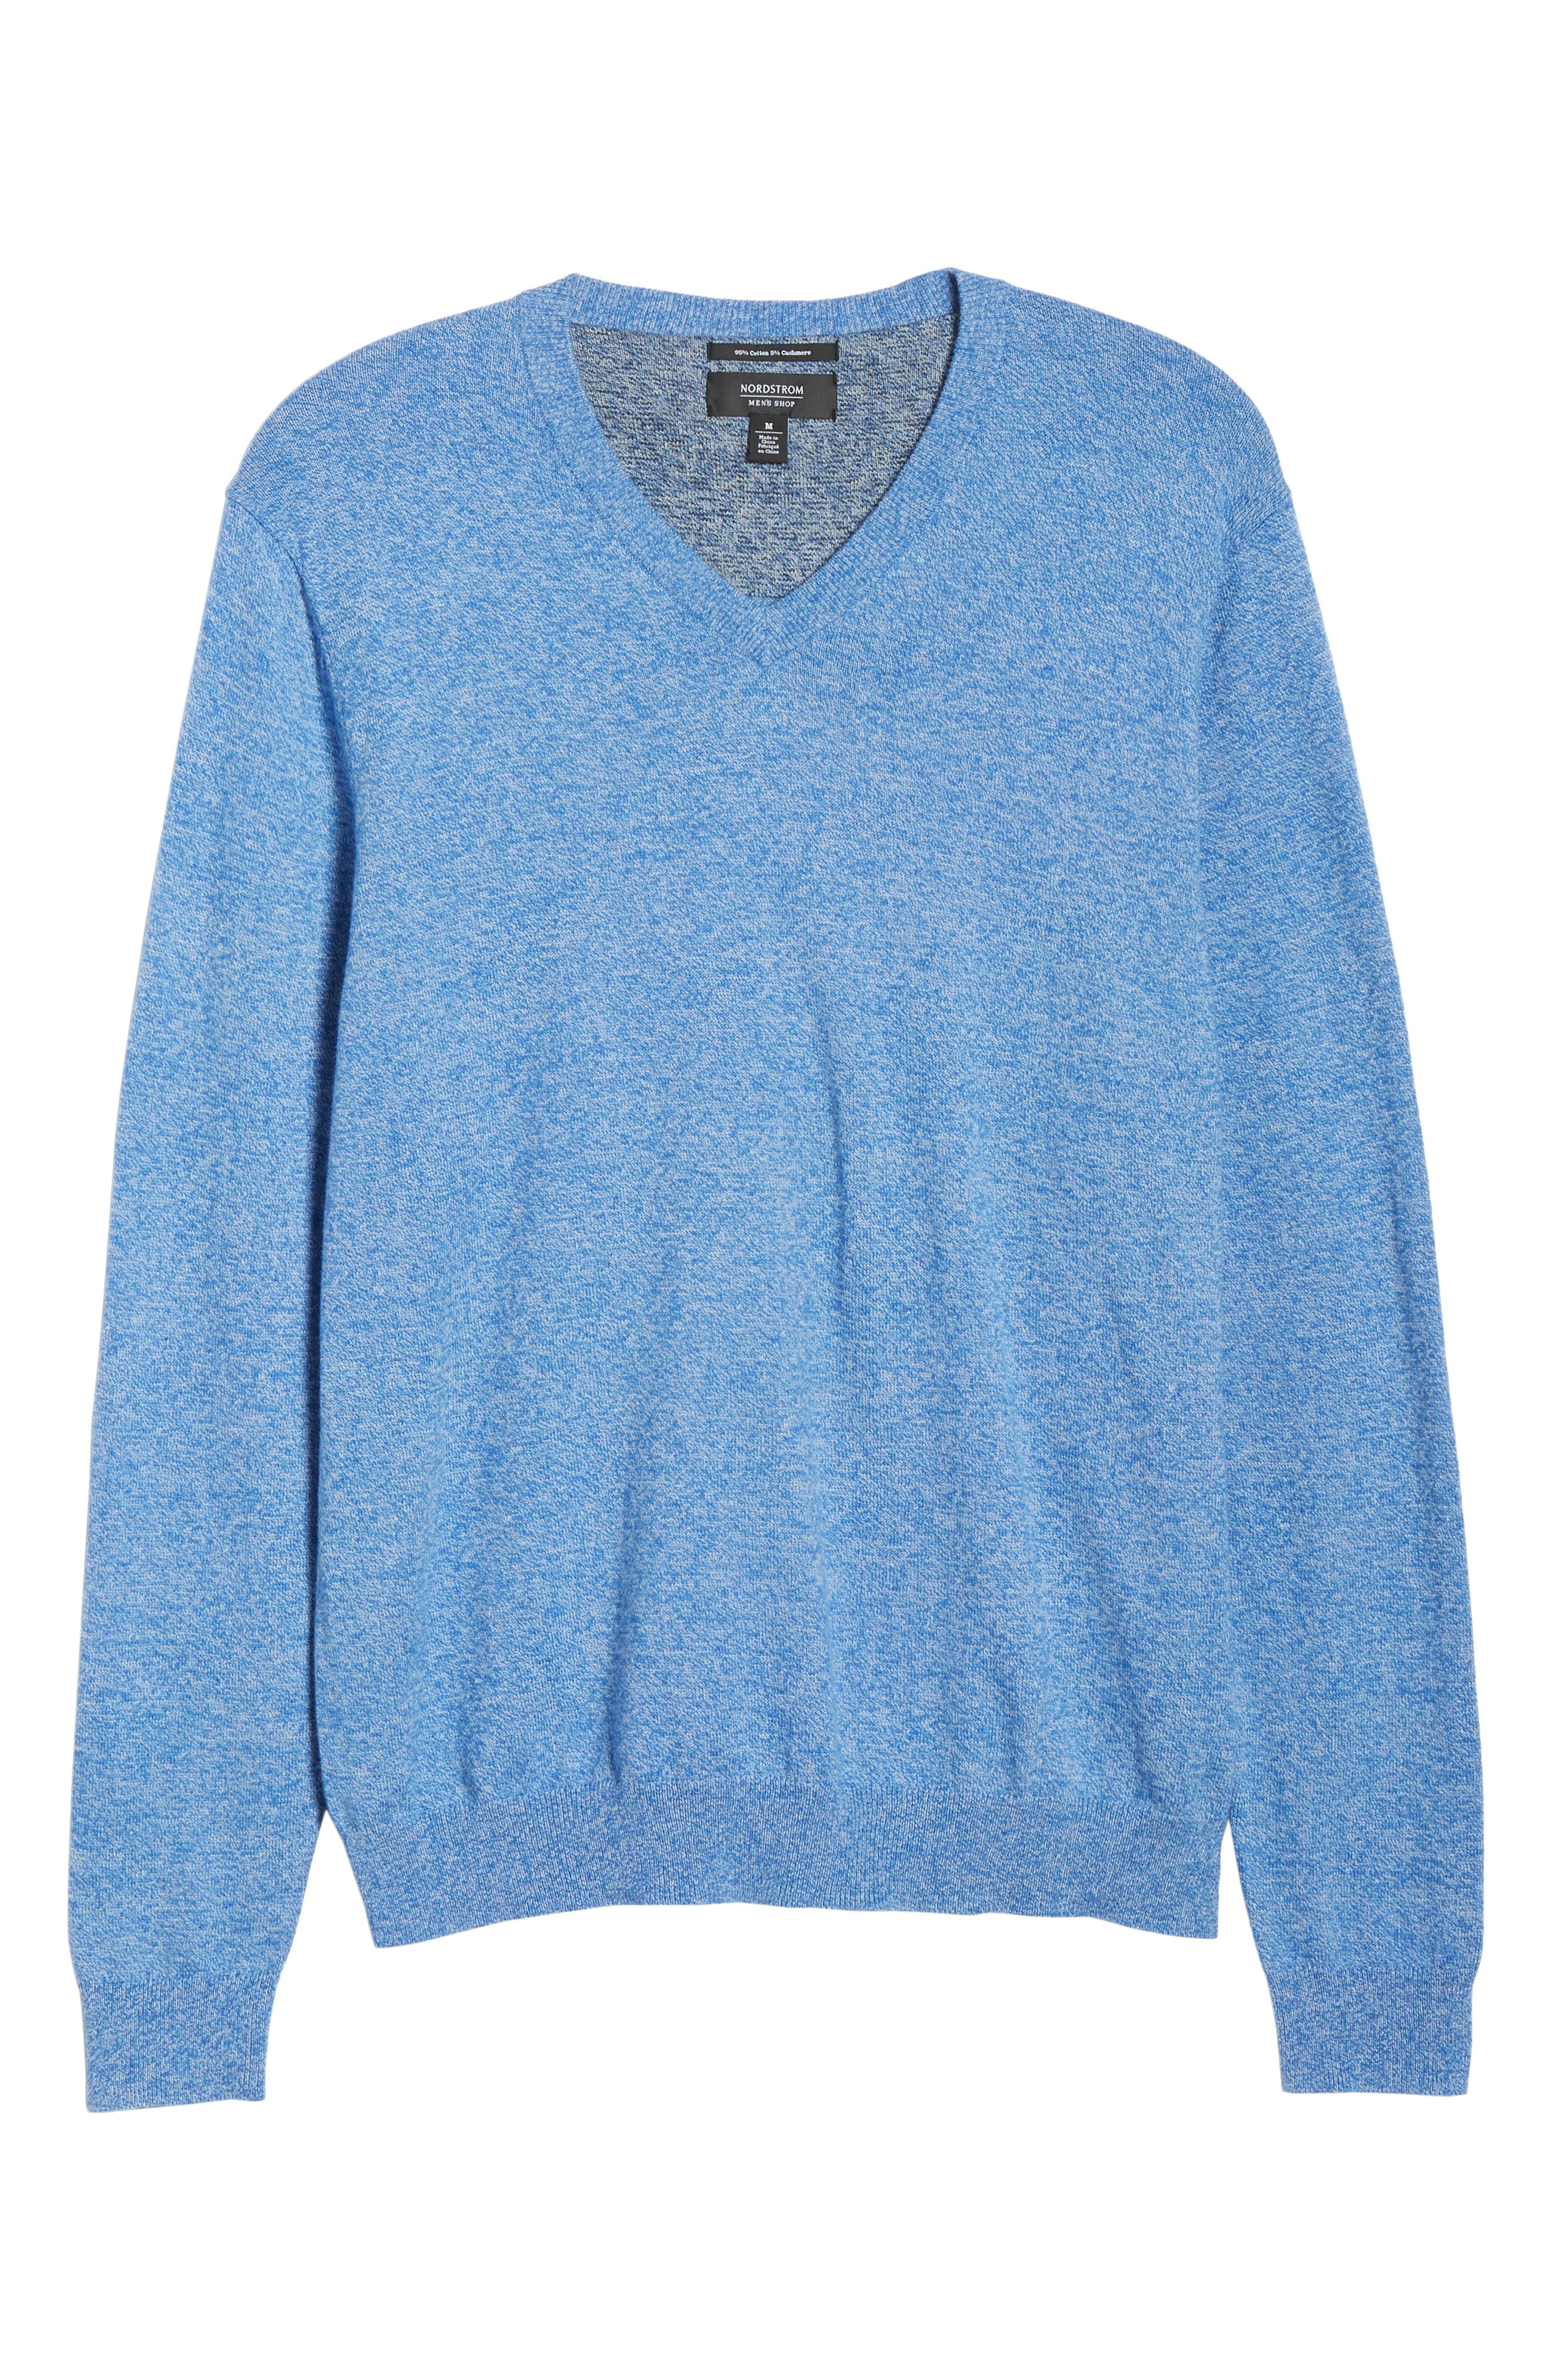 NORDSTROM MEN'S SHOP, Cotton & Cashmere V-Neck Sweater, Alternate thumbnail 6, color, BLUE CAMP MARL